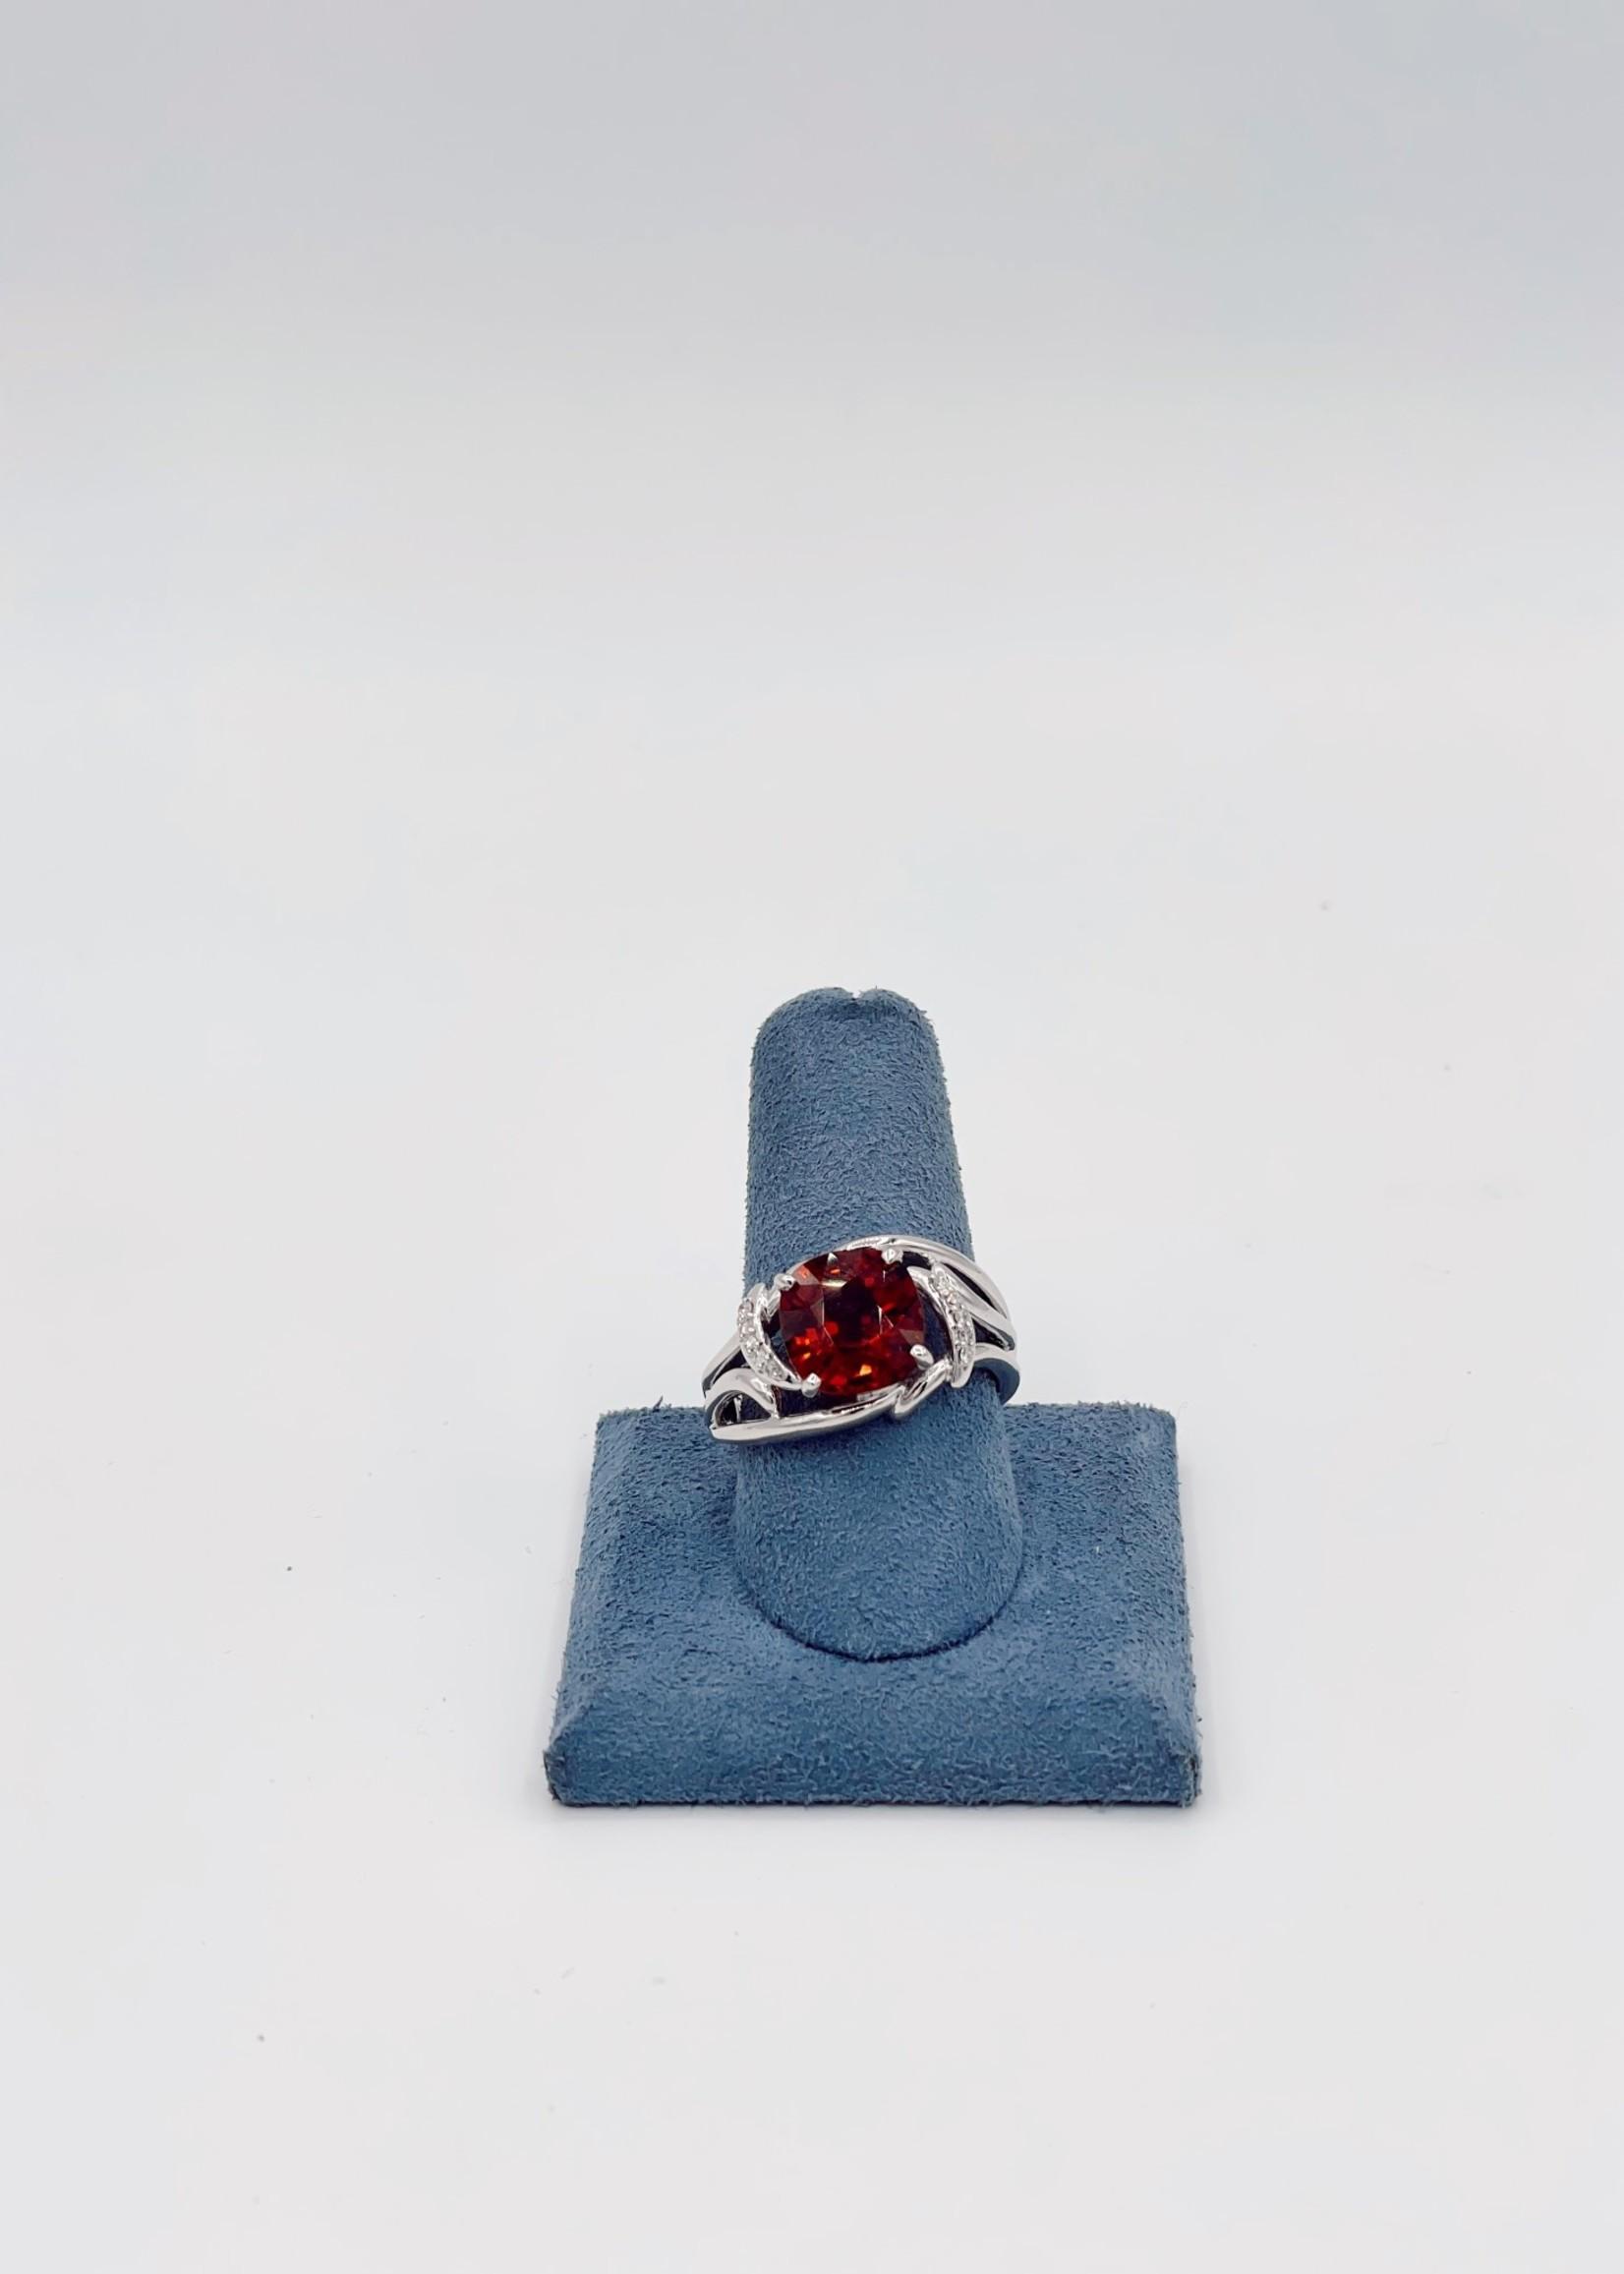 ?Fashion Ring 4.94ct Cus GA .07tdwRD DI 18k W